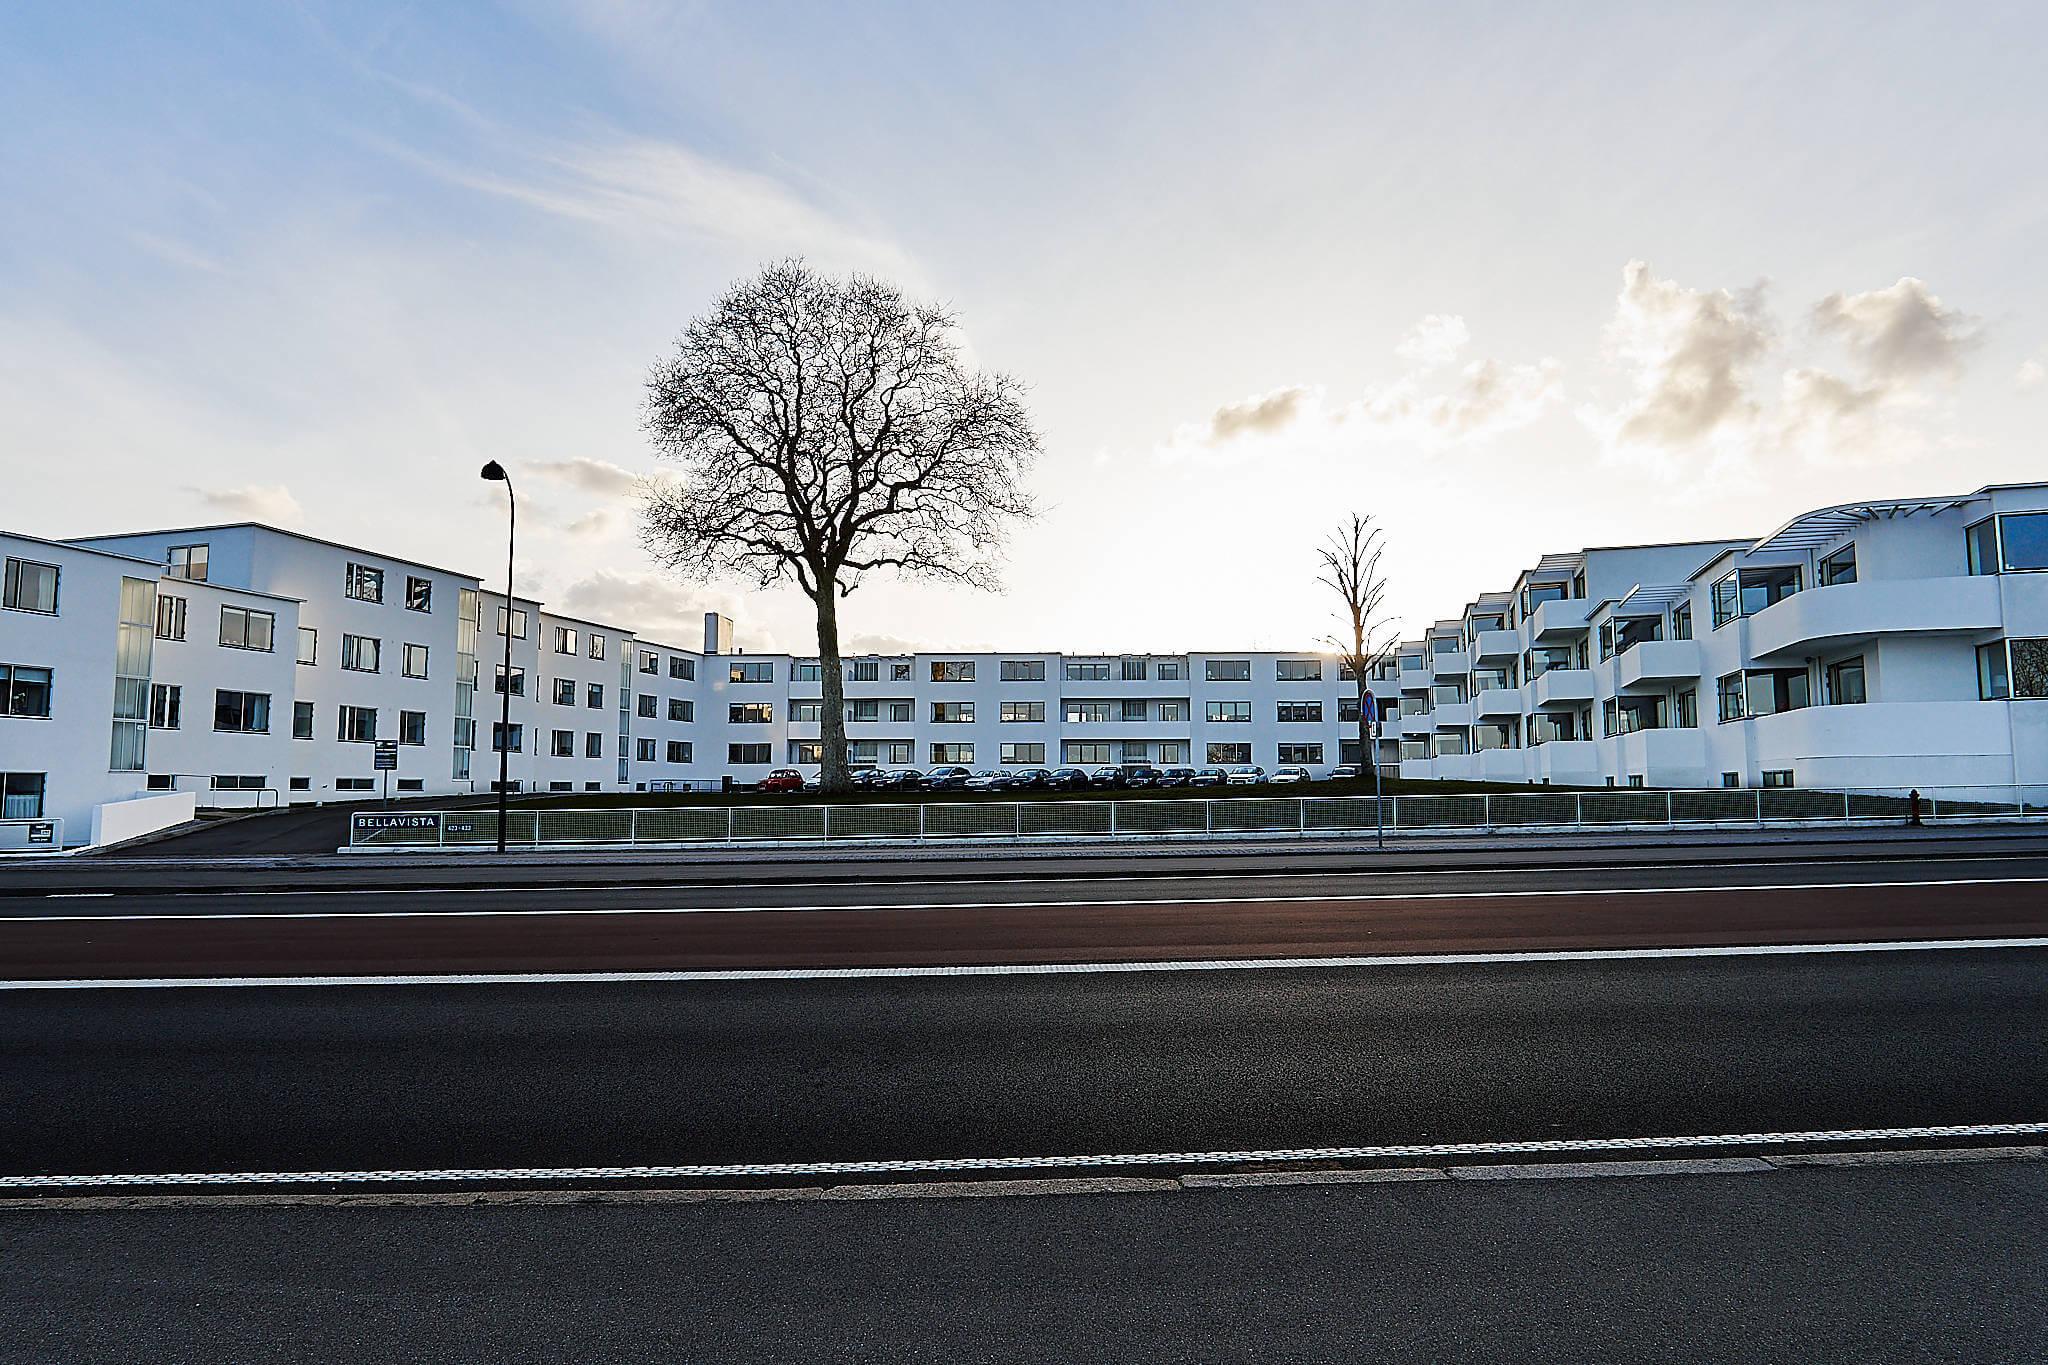 Bella Vista by Arne Jacobsen, Klampenborg, Denmark